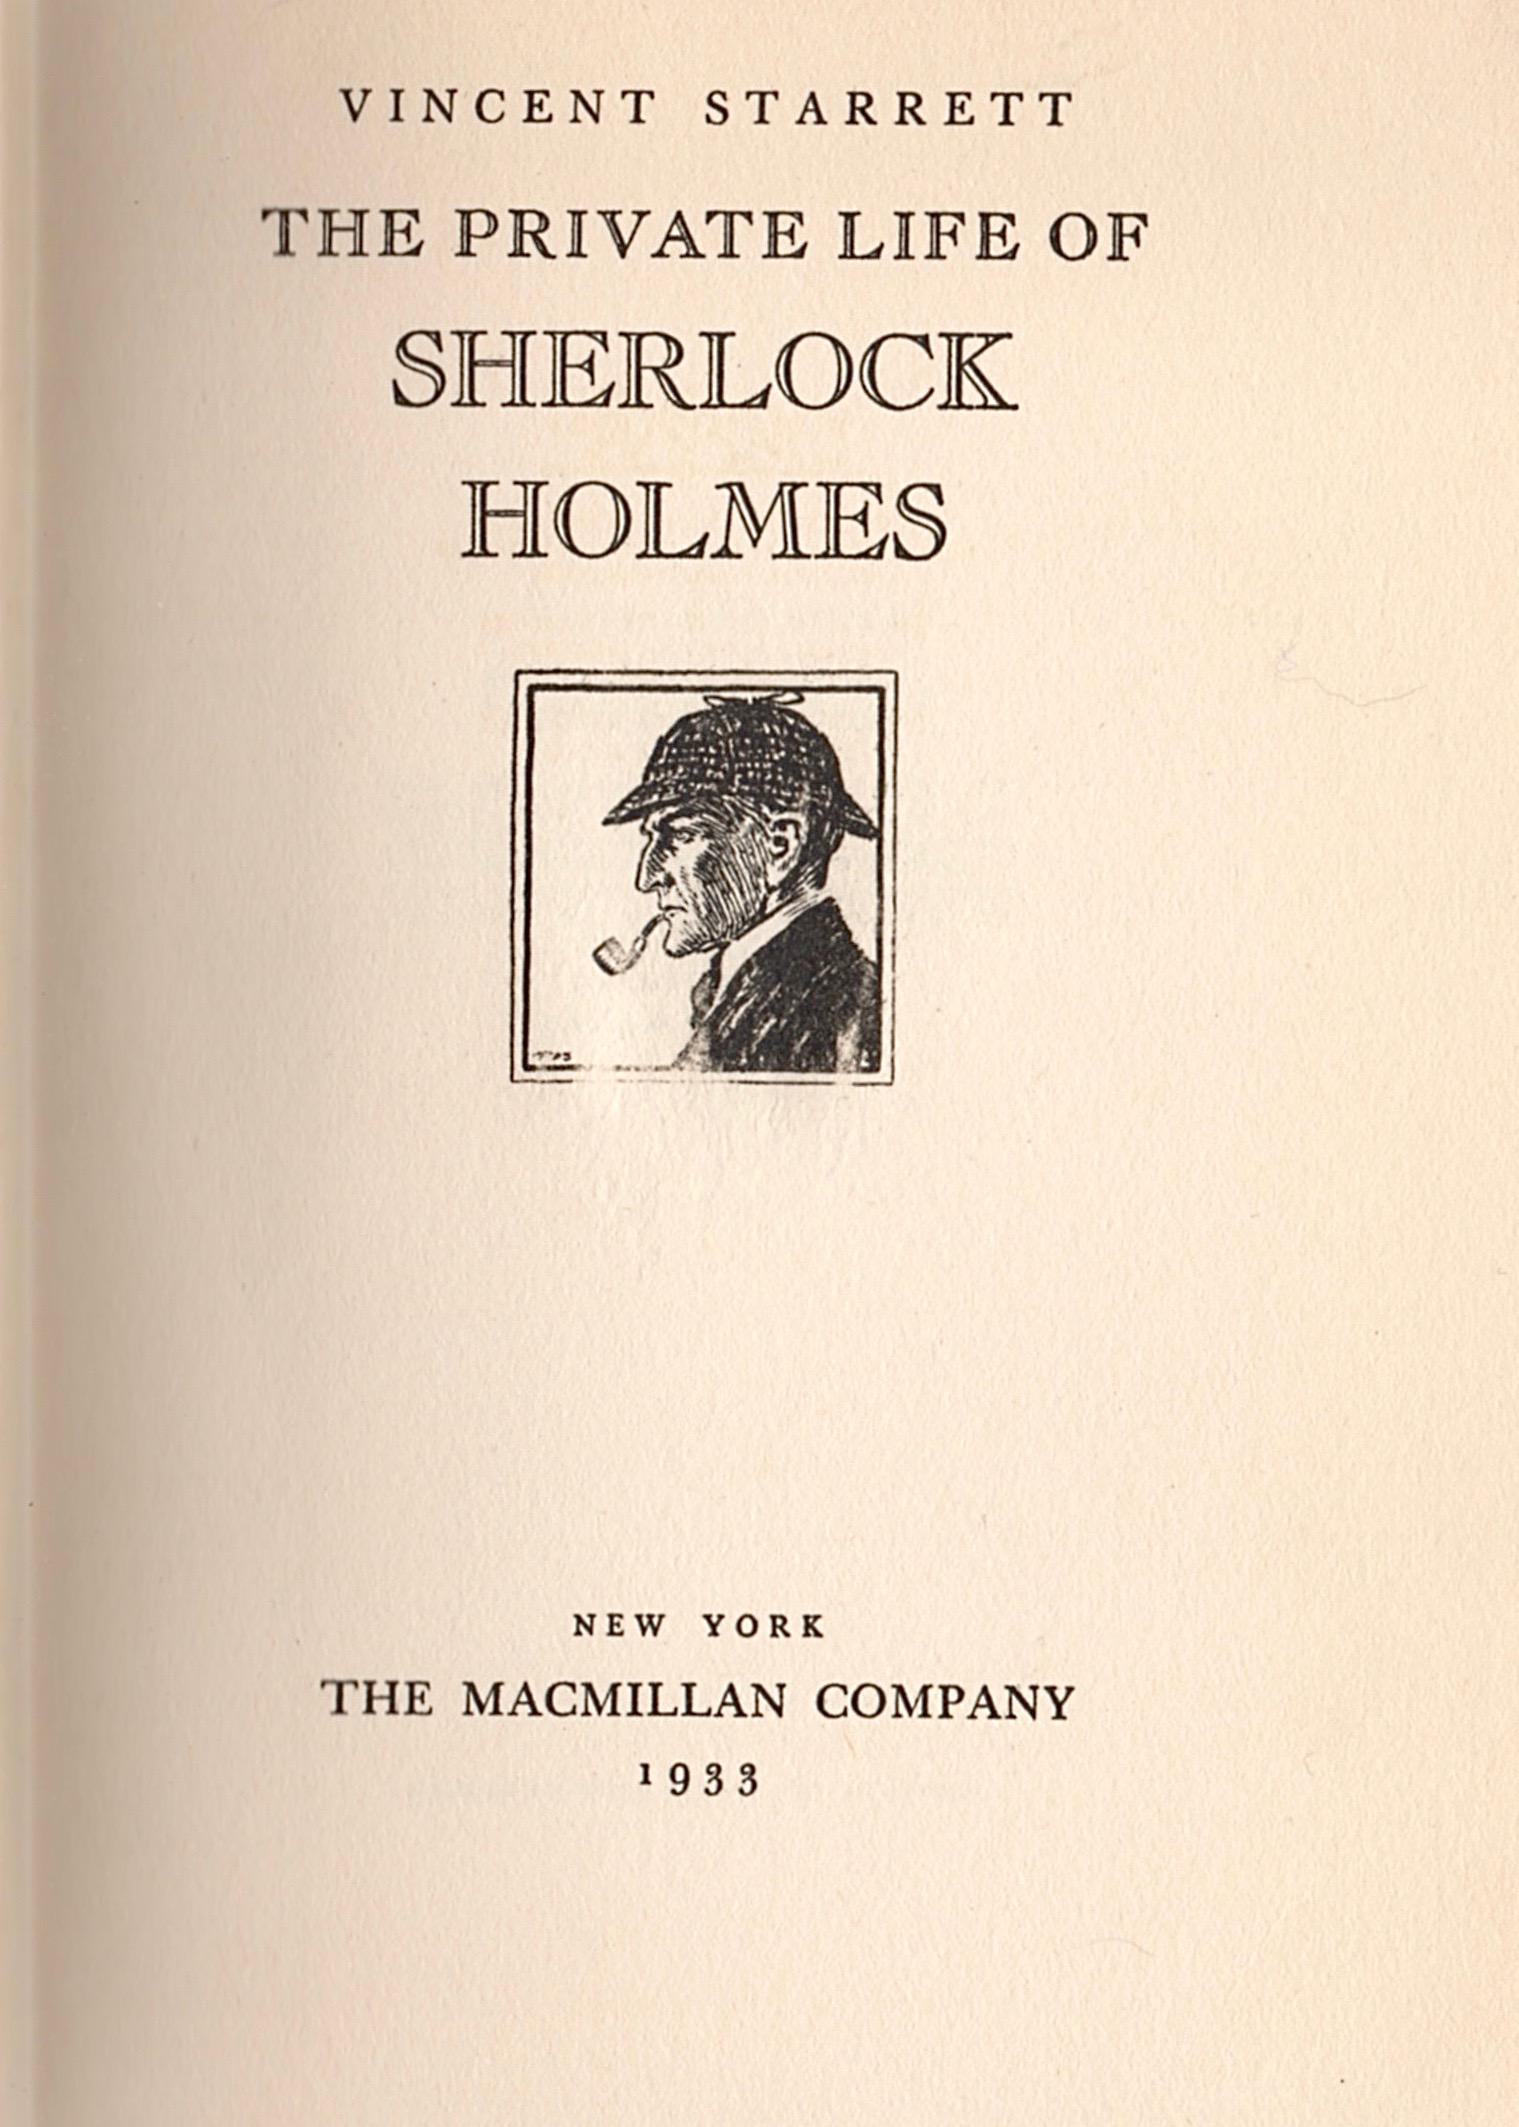 TPLOSH 1934 Title Page.jpg